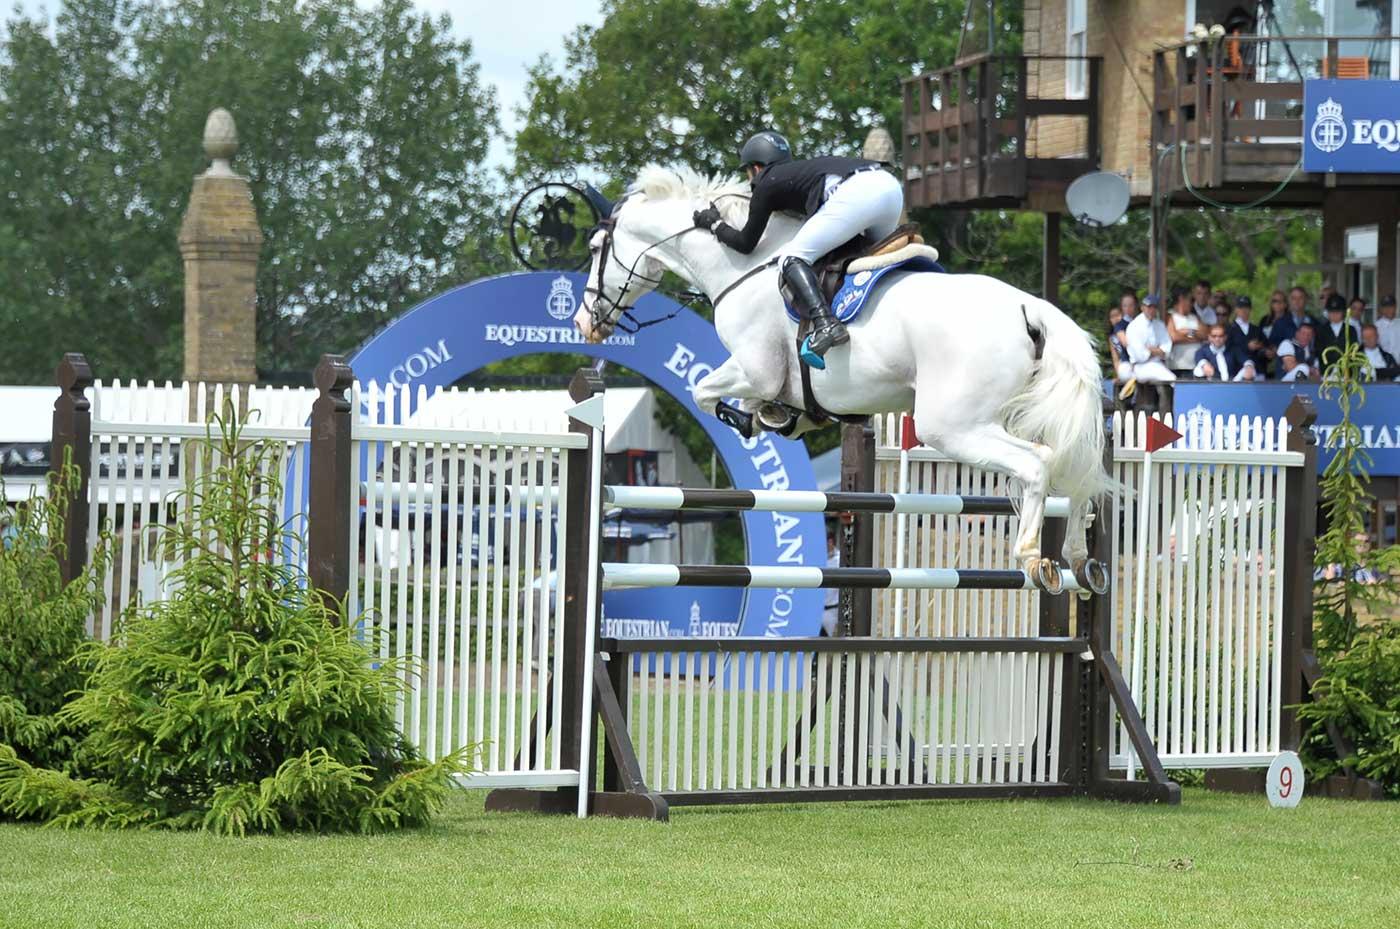 Planx Equestrian Photography - hi43561